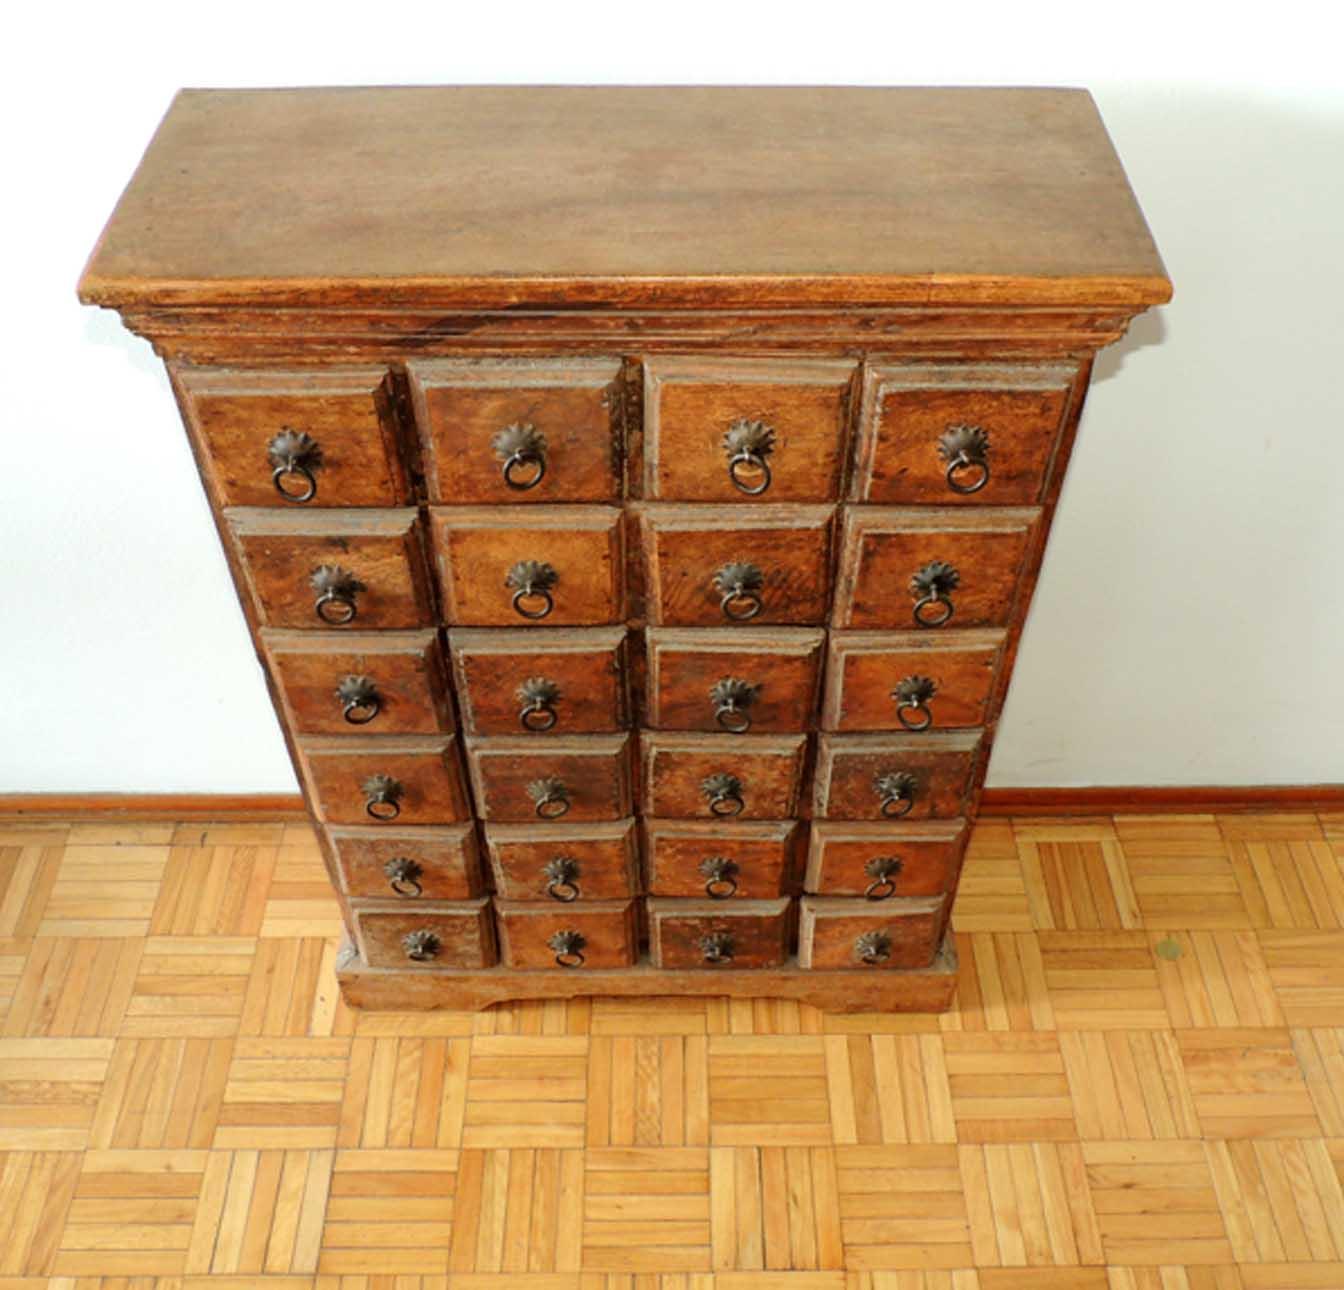 Mueble cajonero en madera dura gran peso el perro naranja for Mueble fichero